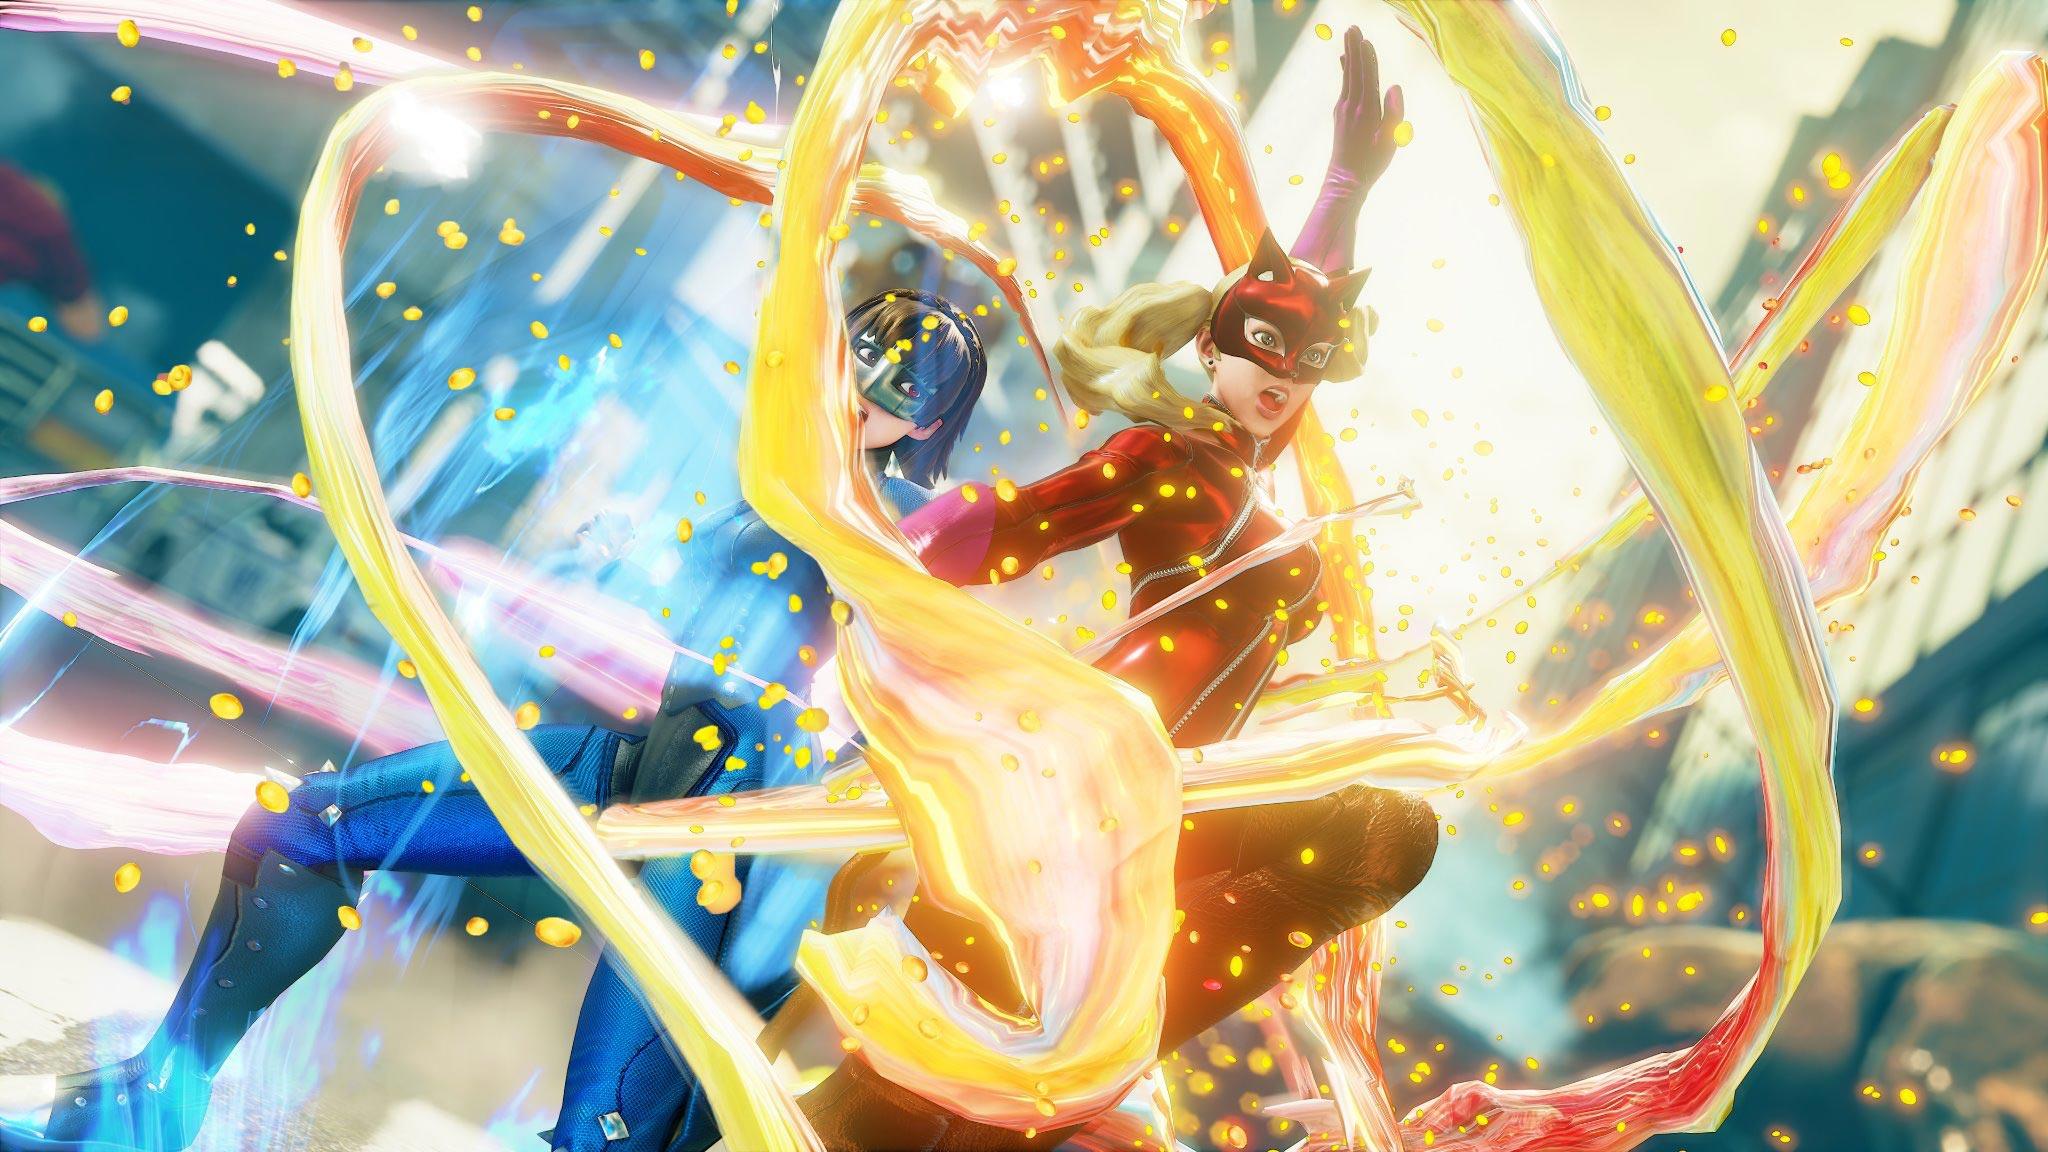 Eden's Street Fighter stills 1 out of 12 image gallery